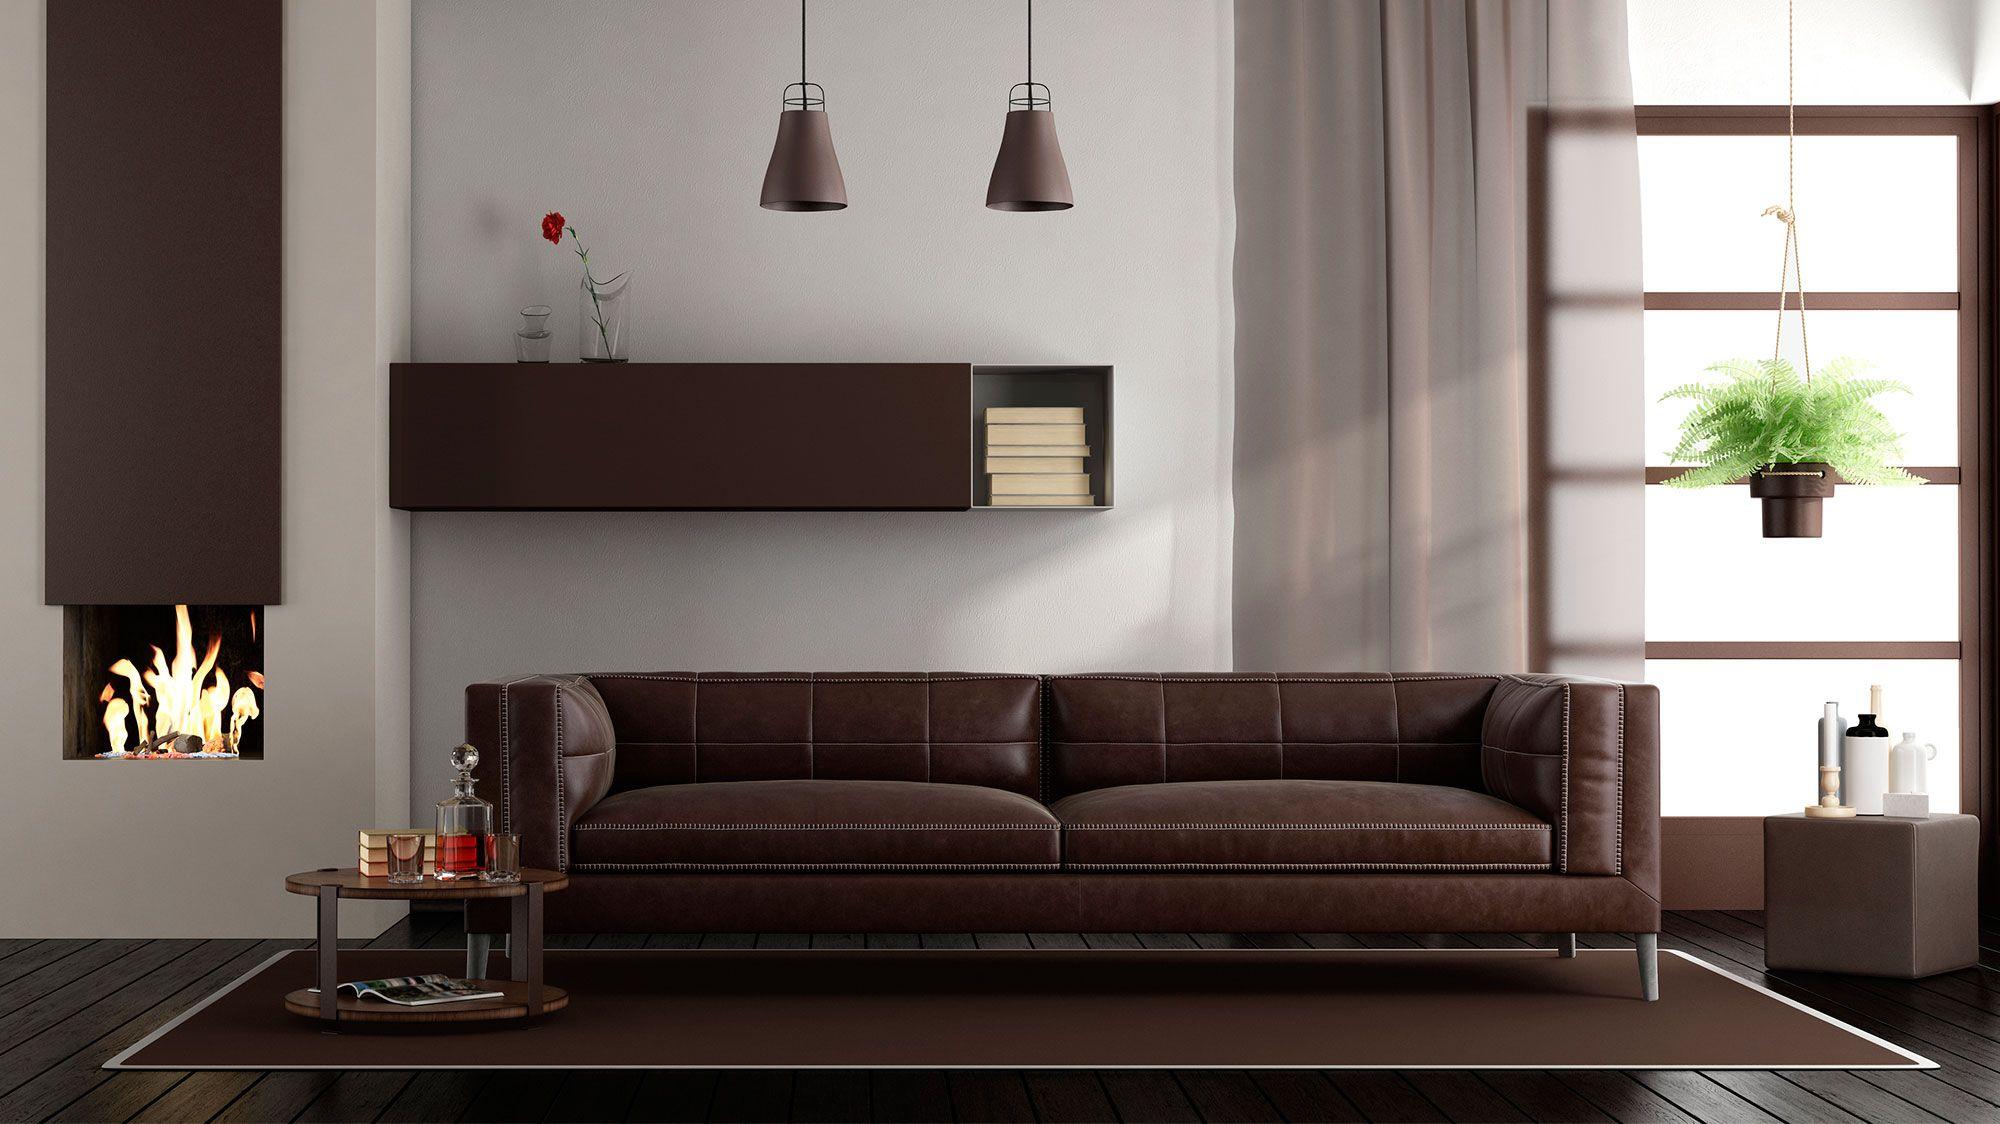 C mo combinar un sof marr n hogarmania for Combinar colores decoracion salon